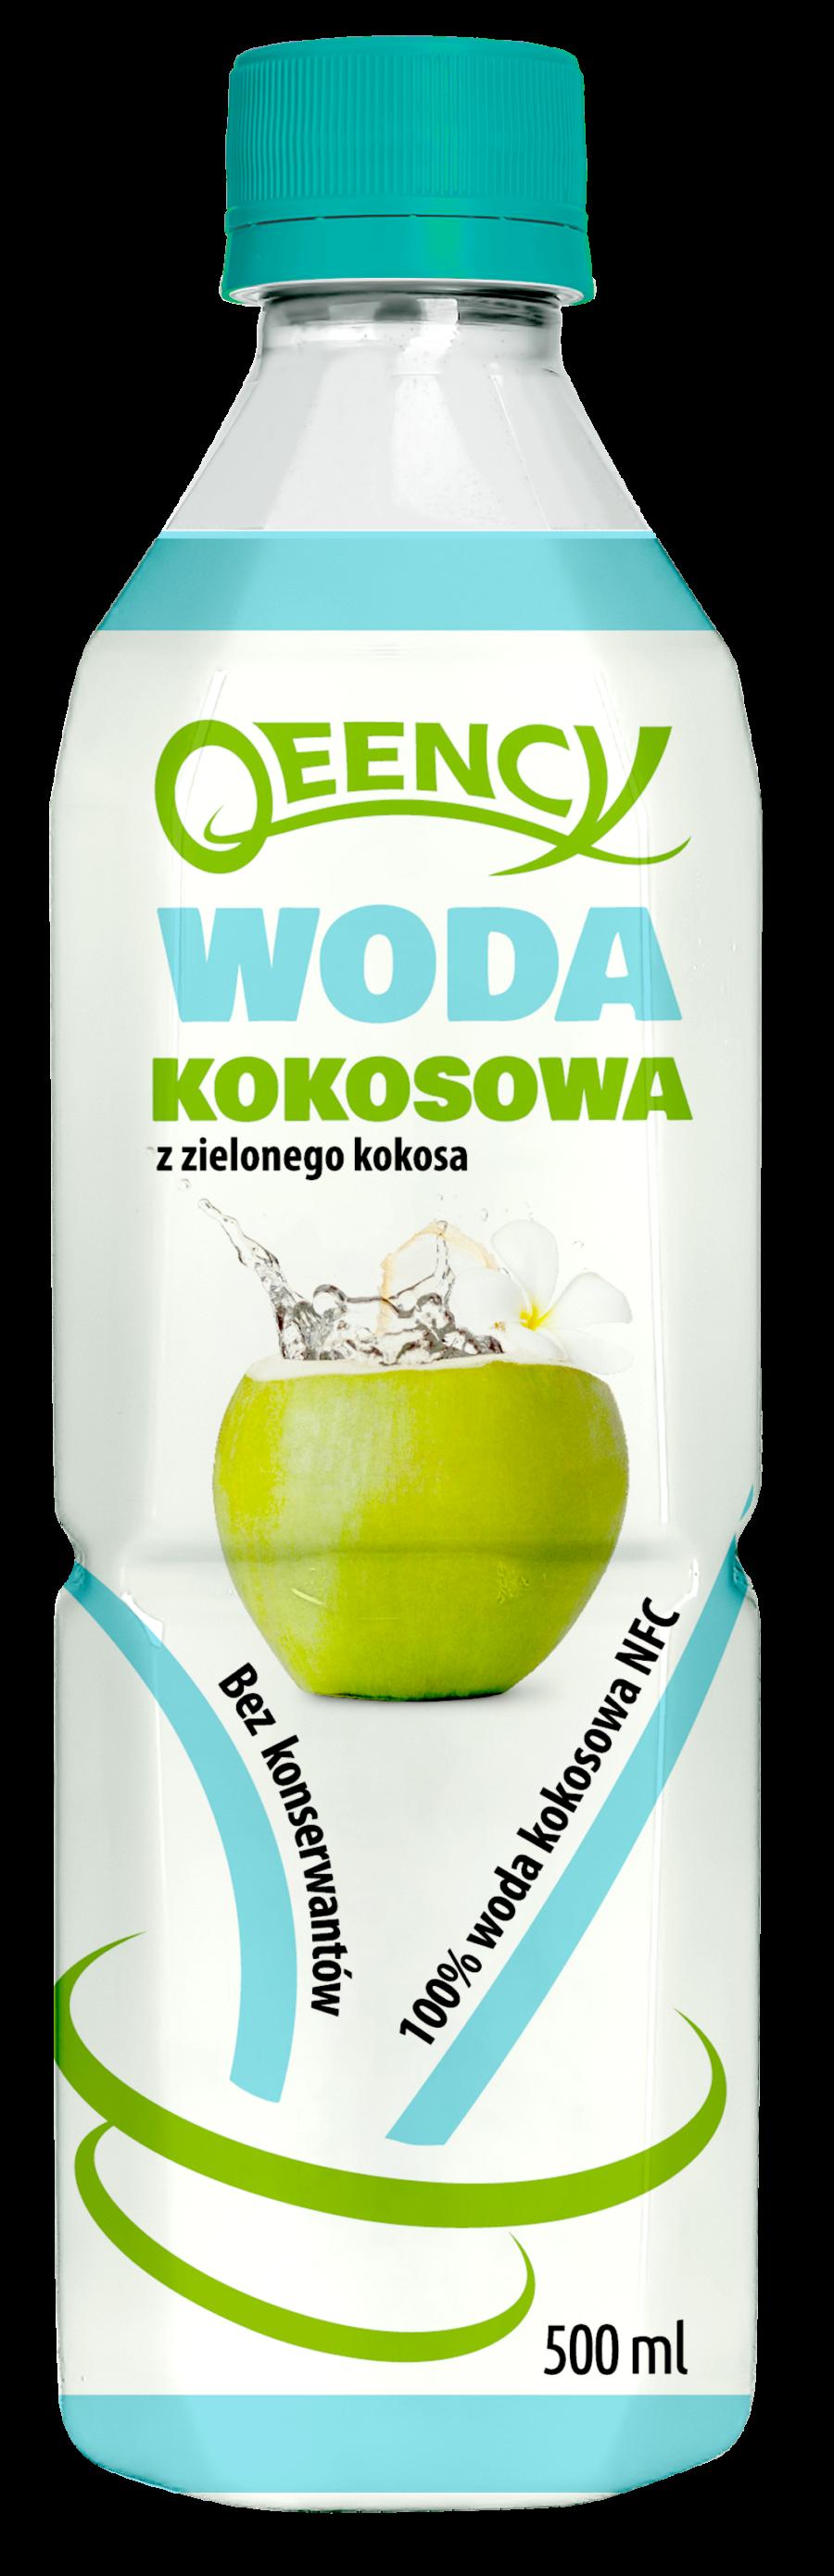 woda kokosowa Qeency